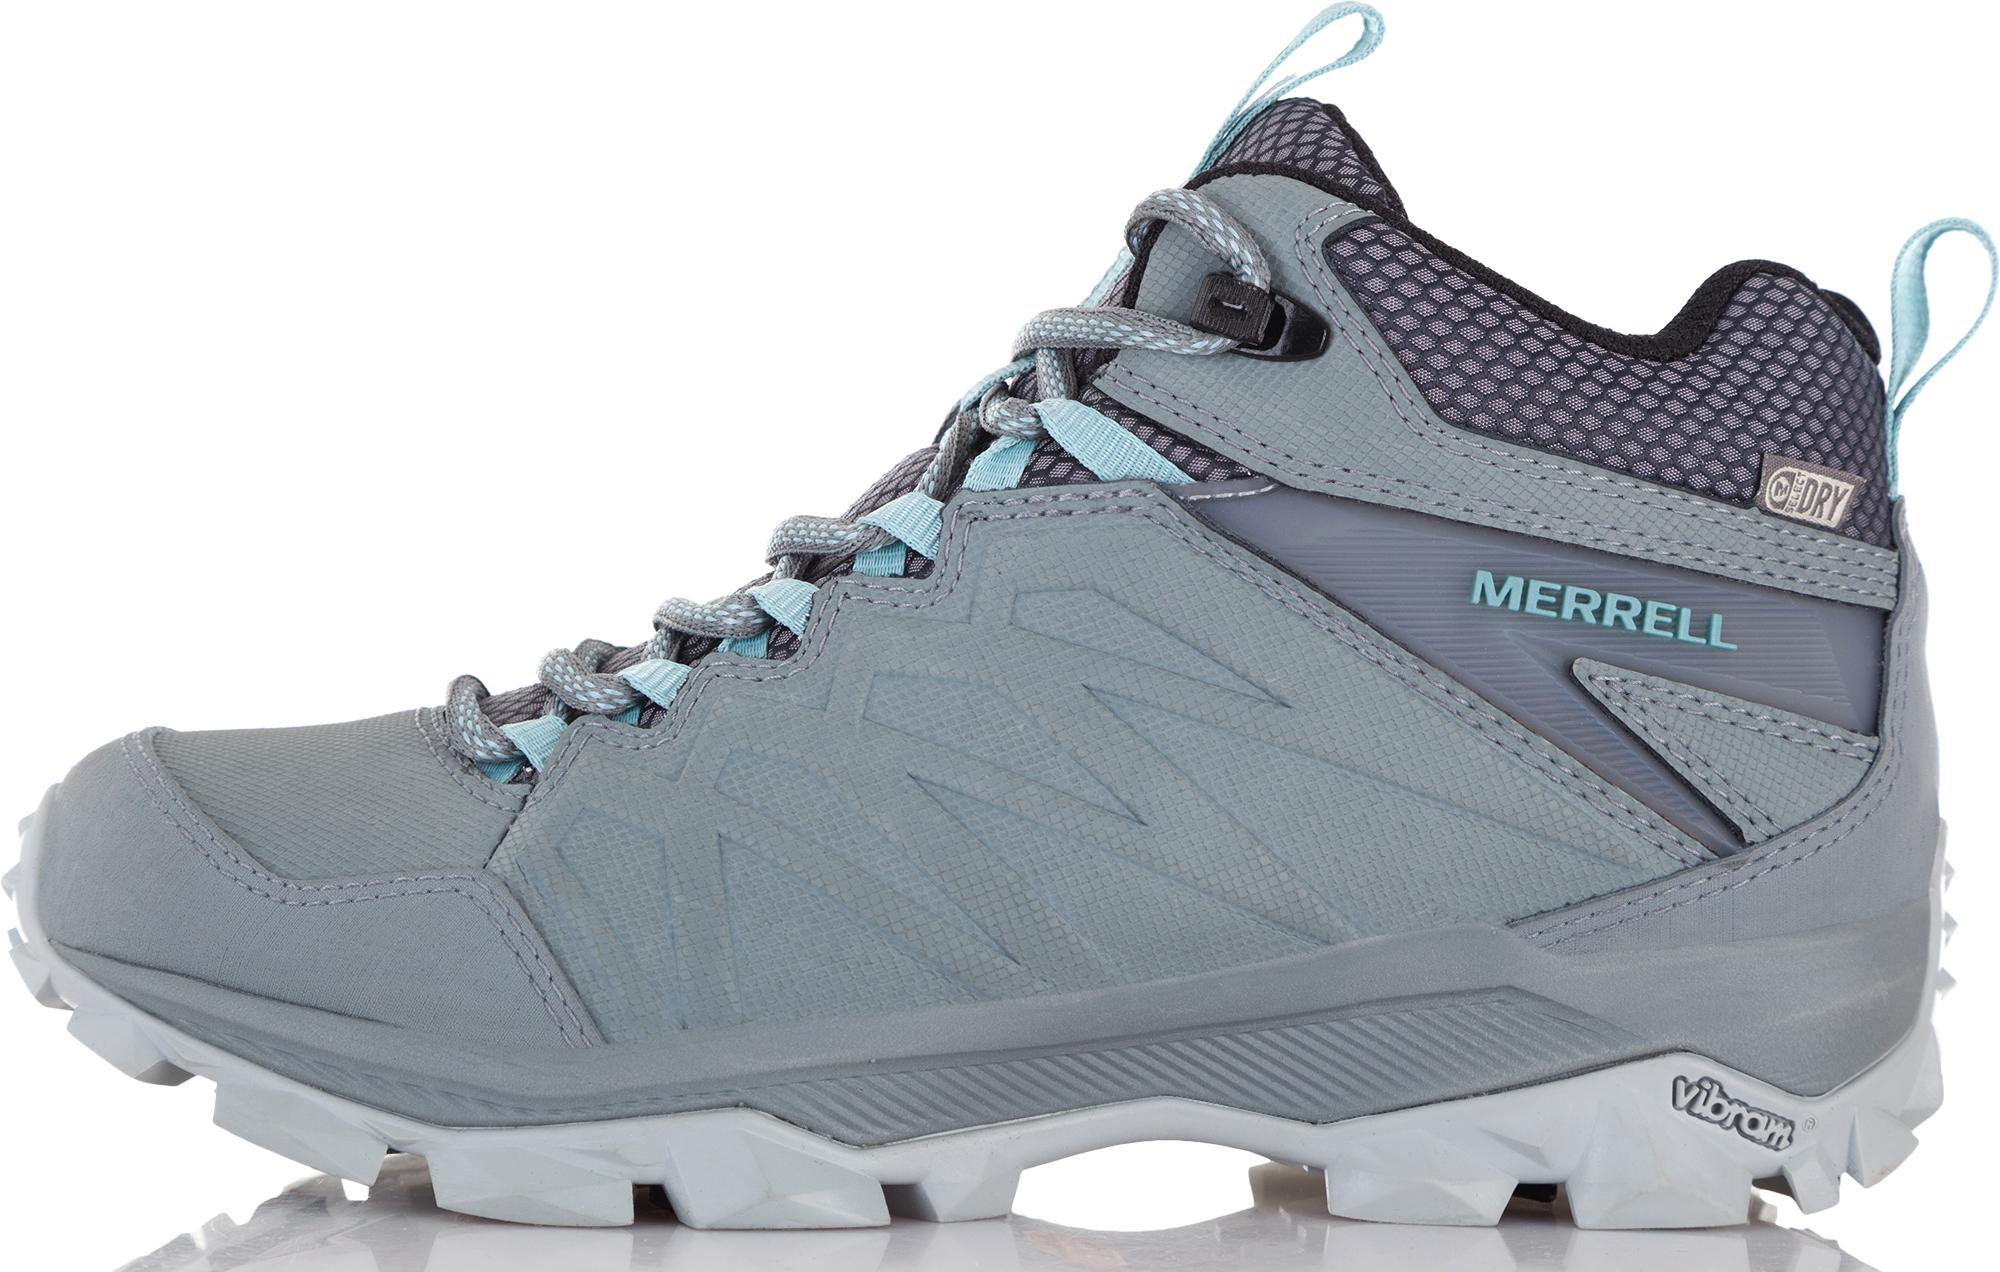 Merrell Ботинки утепленные женские Merrell Thermo Freeze Mid Wp, размер 36